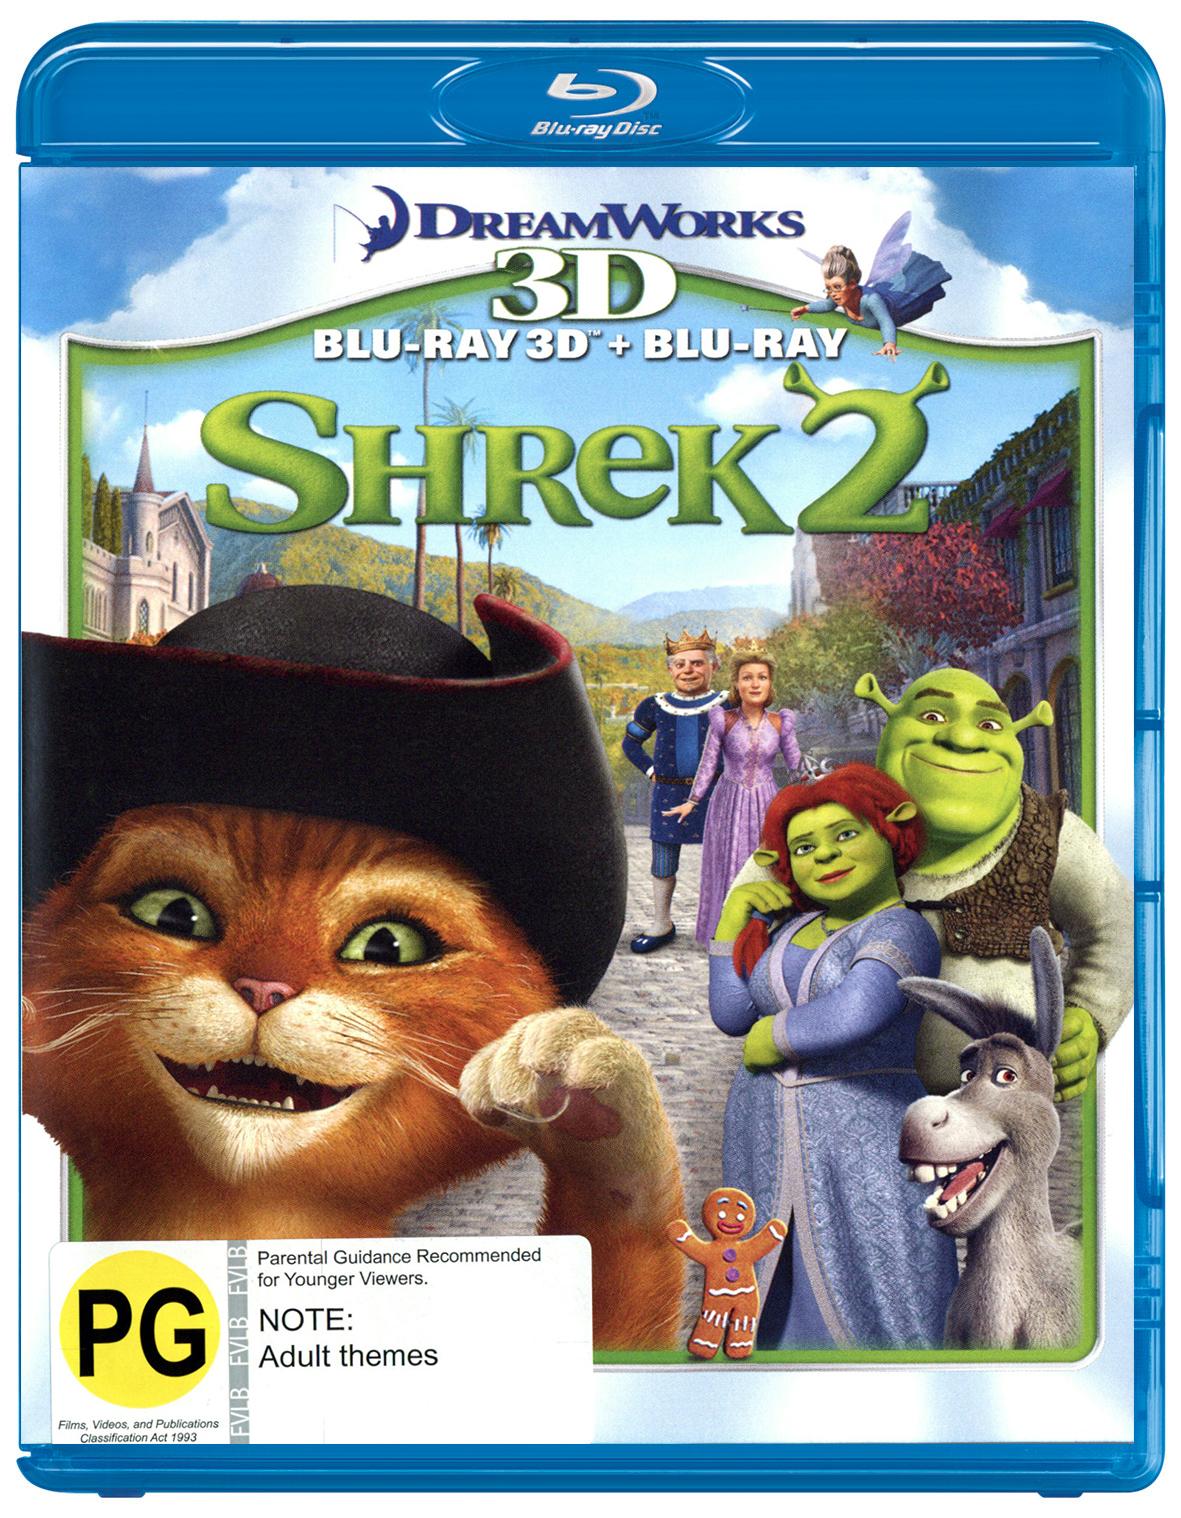 Shrek 2 - 3D Combo on Blu-ray, 3D Blu-ray image